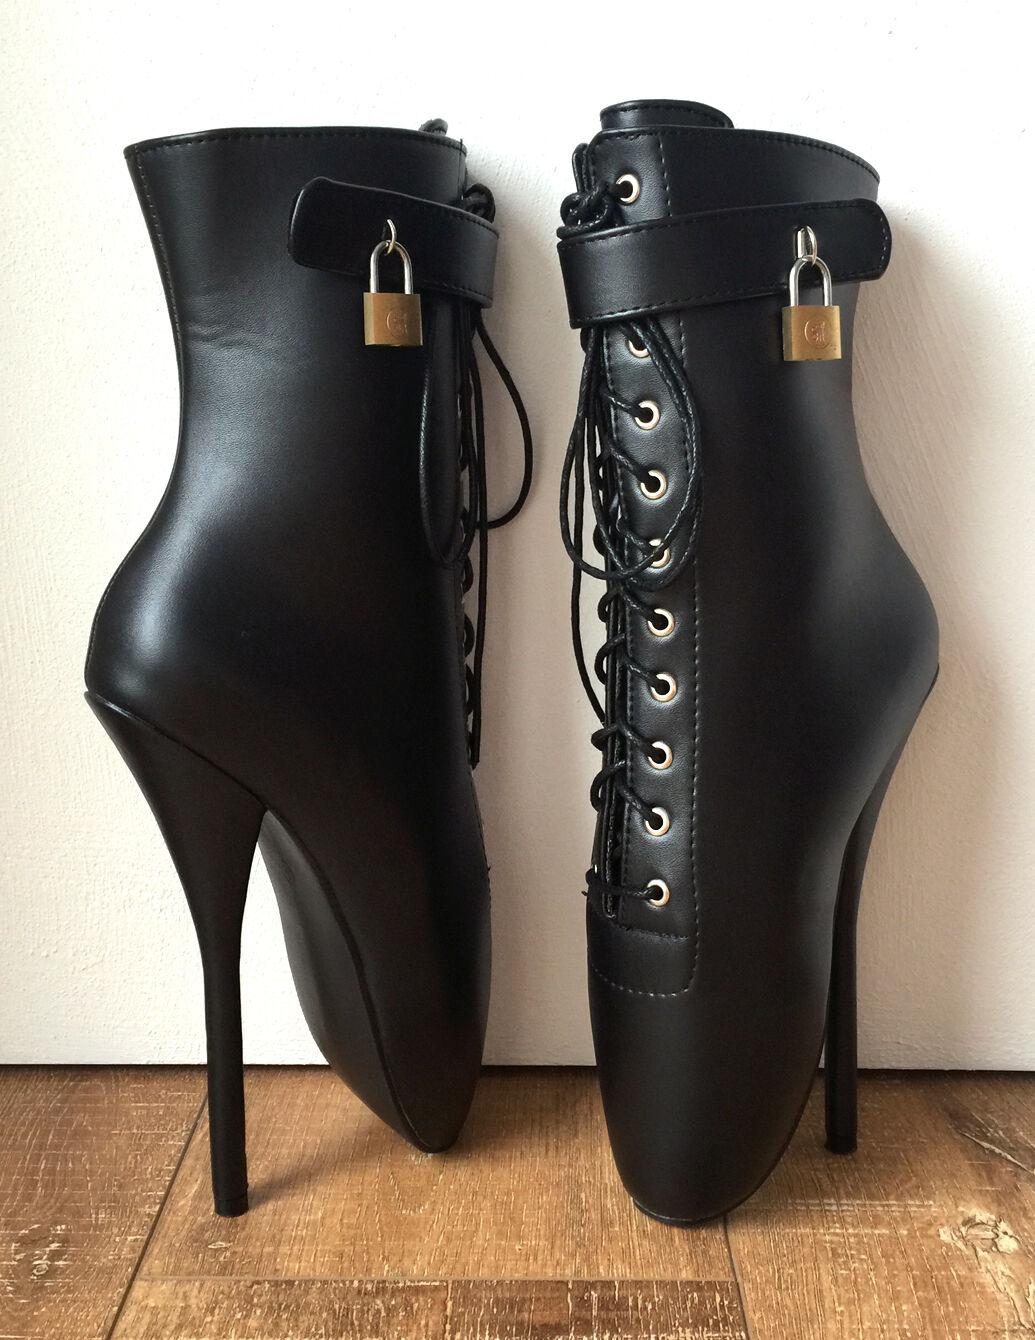 RTBU TRAP Ballet Stiletto Lockable Boots Padlock Padlock Boots Restrain Matte Black 61c3e0